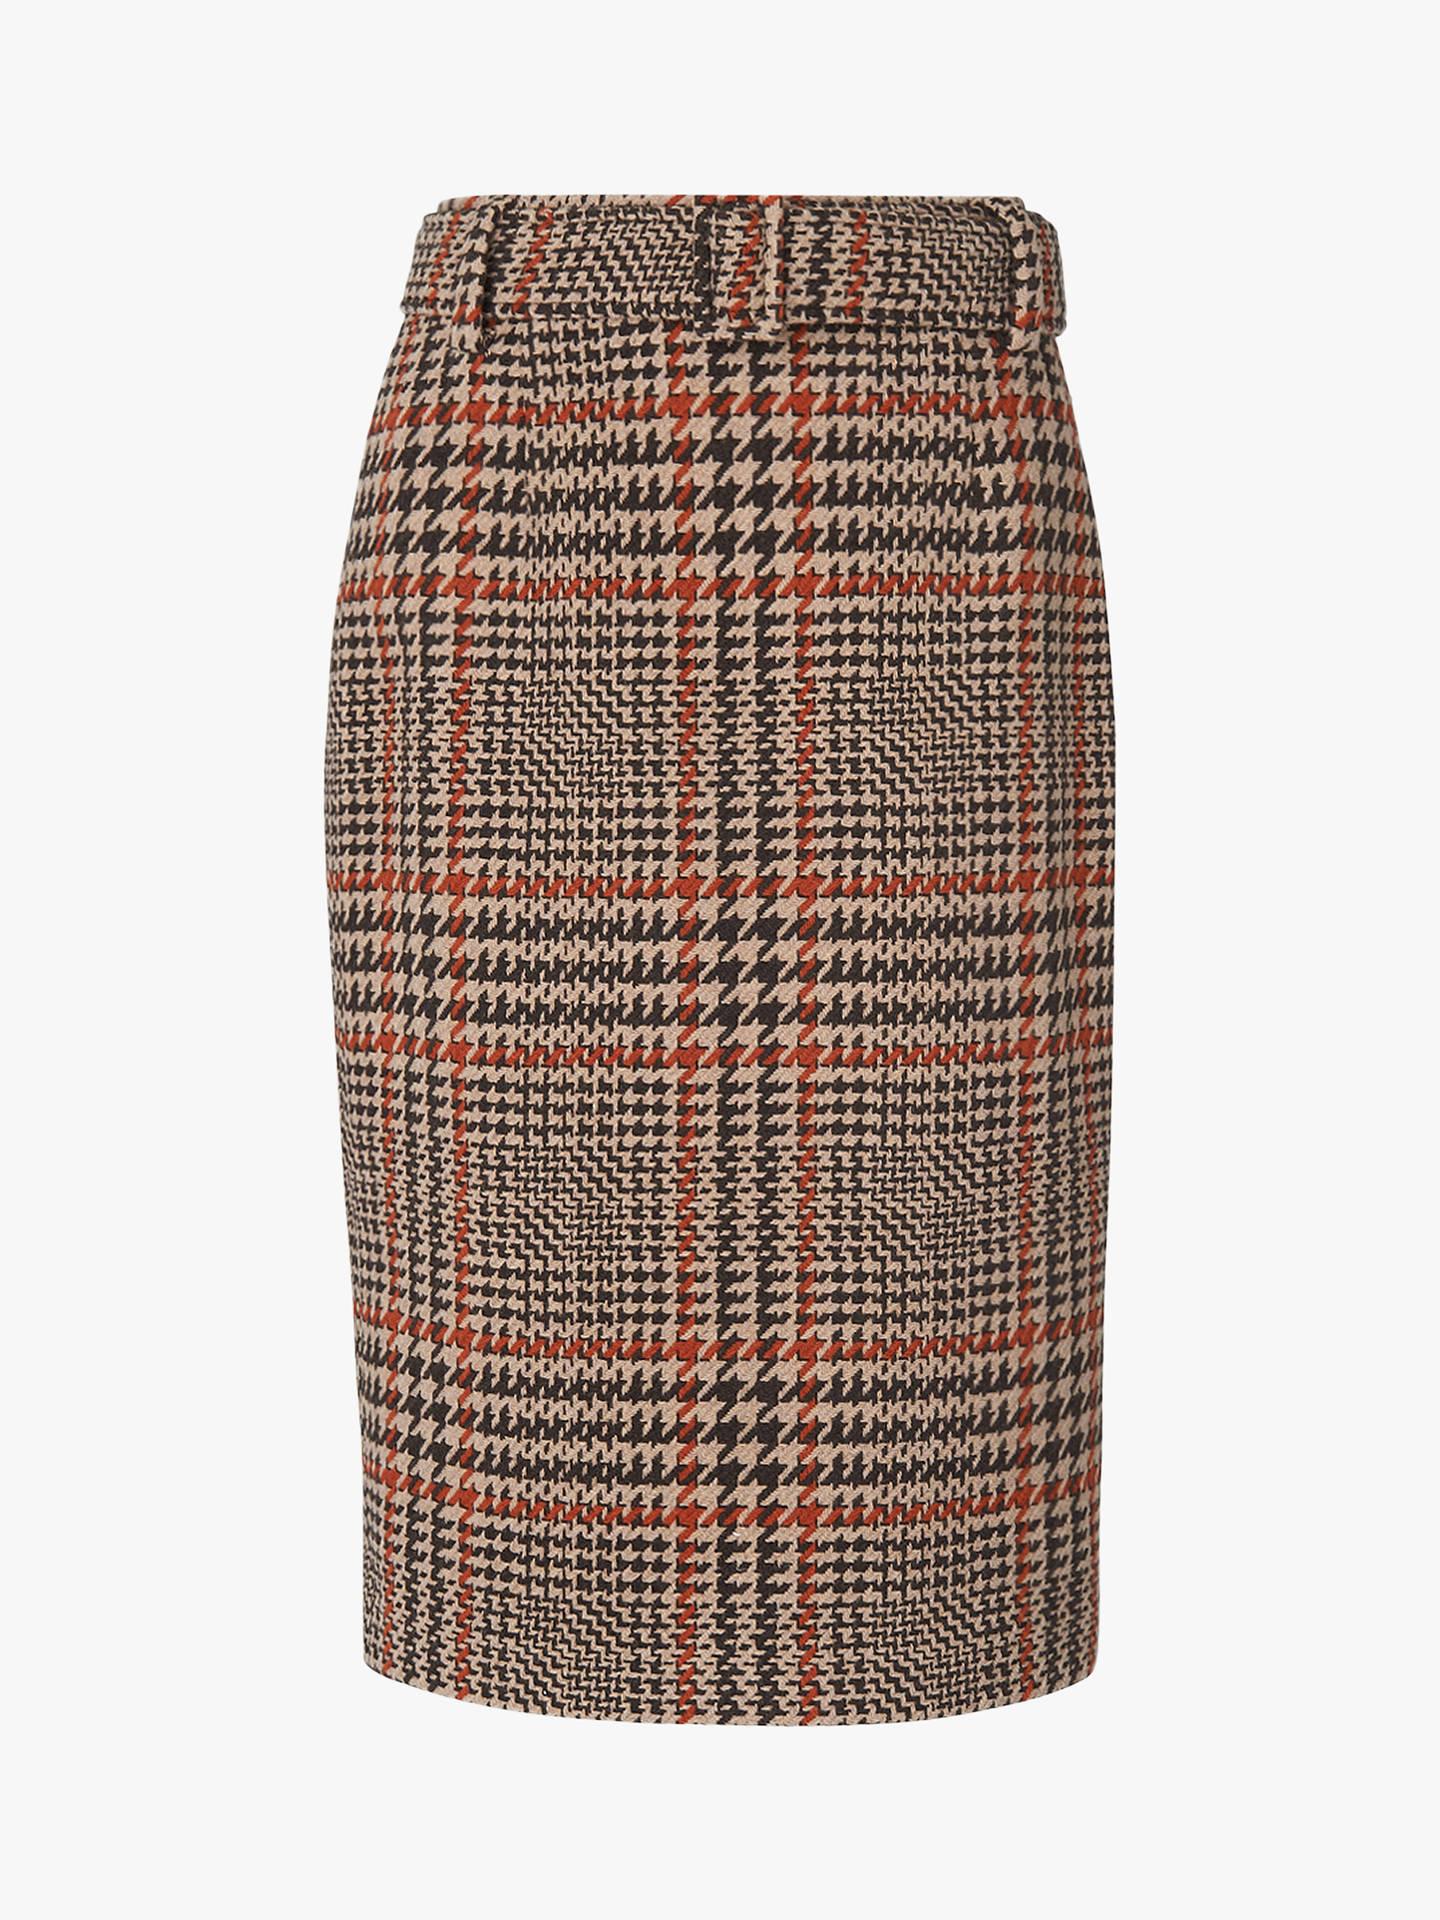 48a56e9ee8 Buy L.K.Bennett Aimee Tweed Skirt, Brown, 10 Online at johnlewis.com